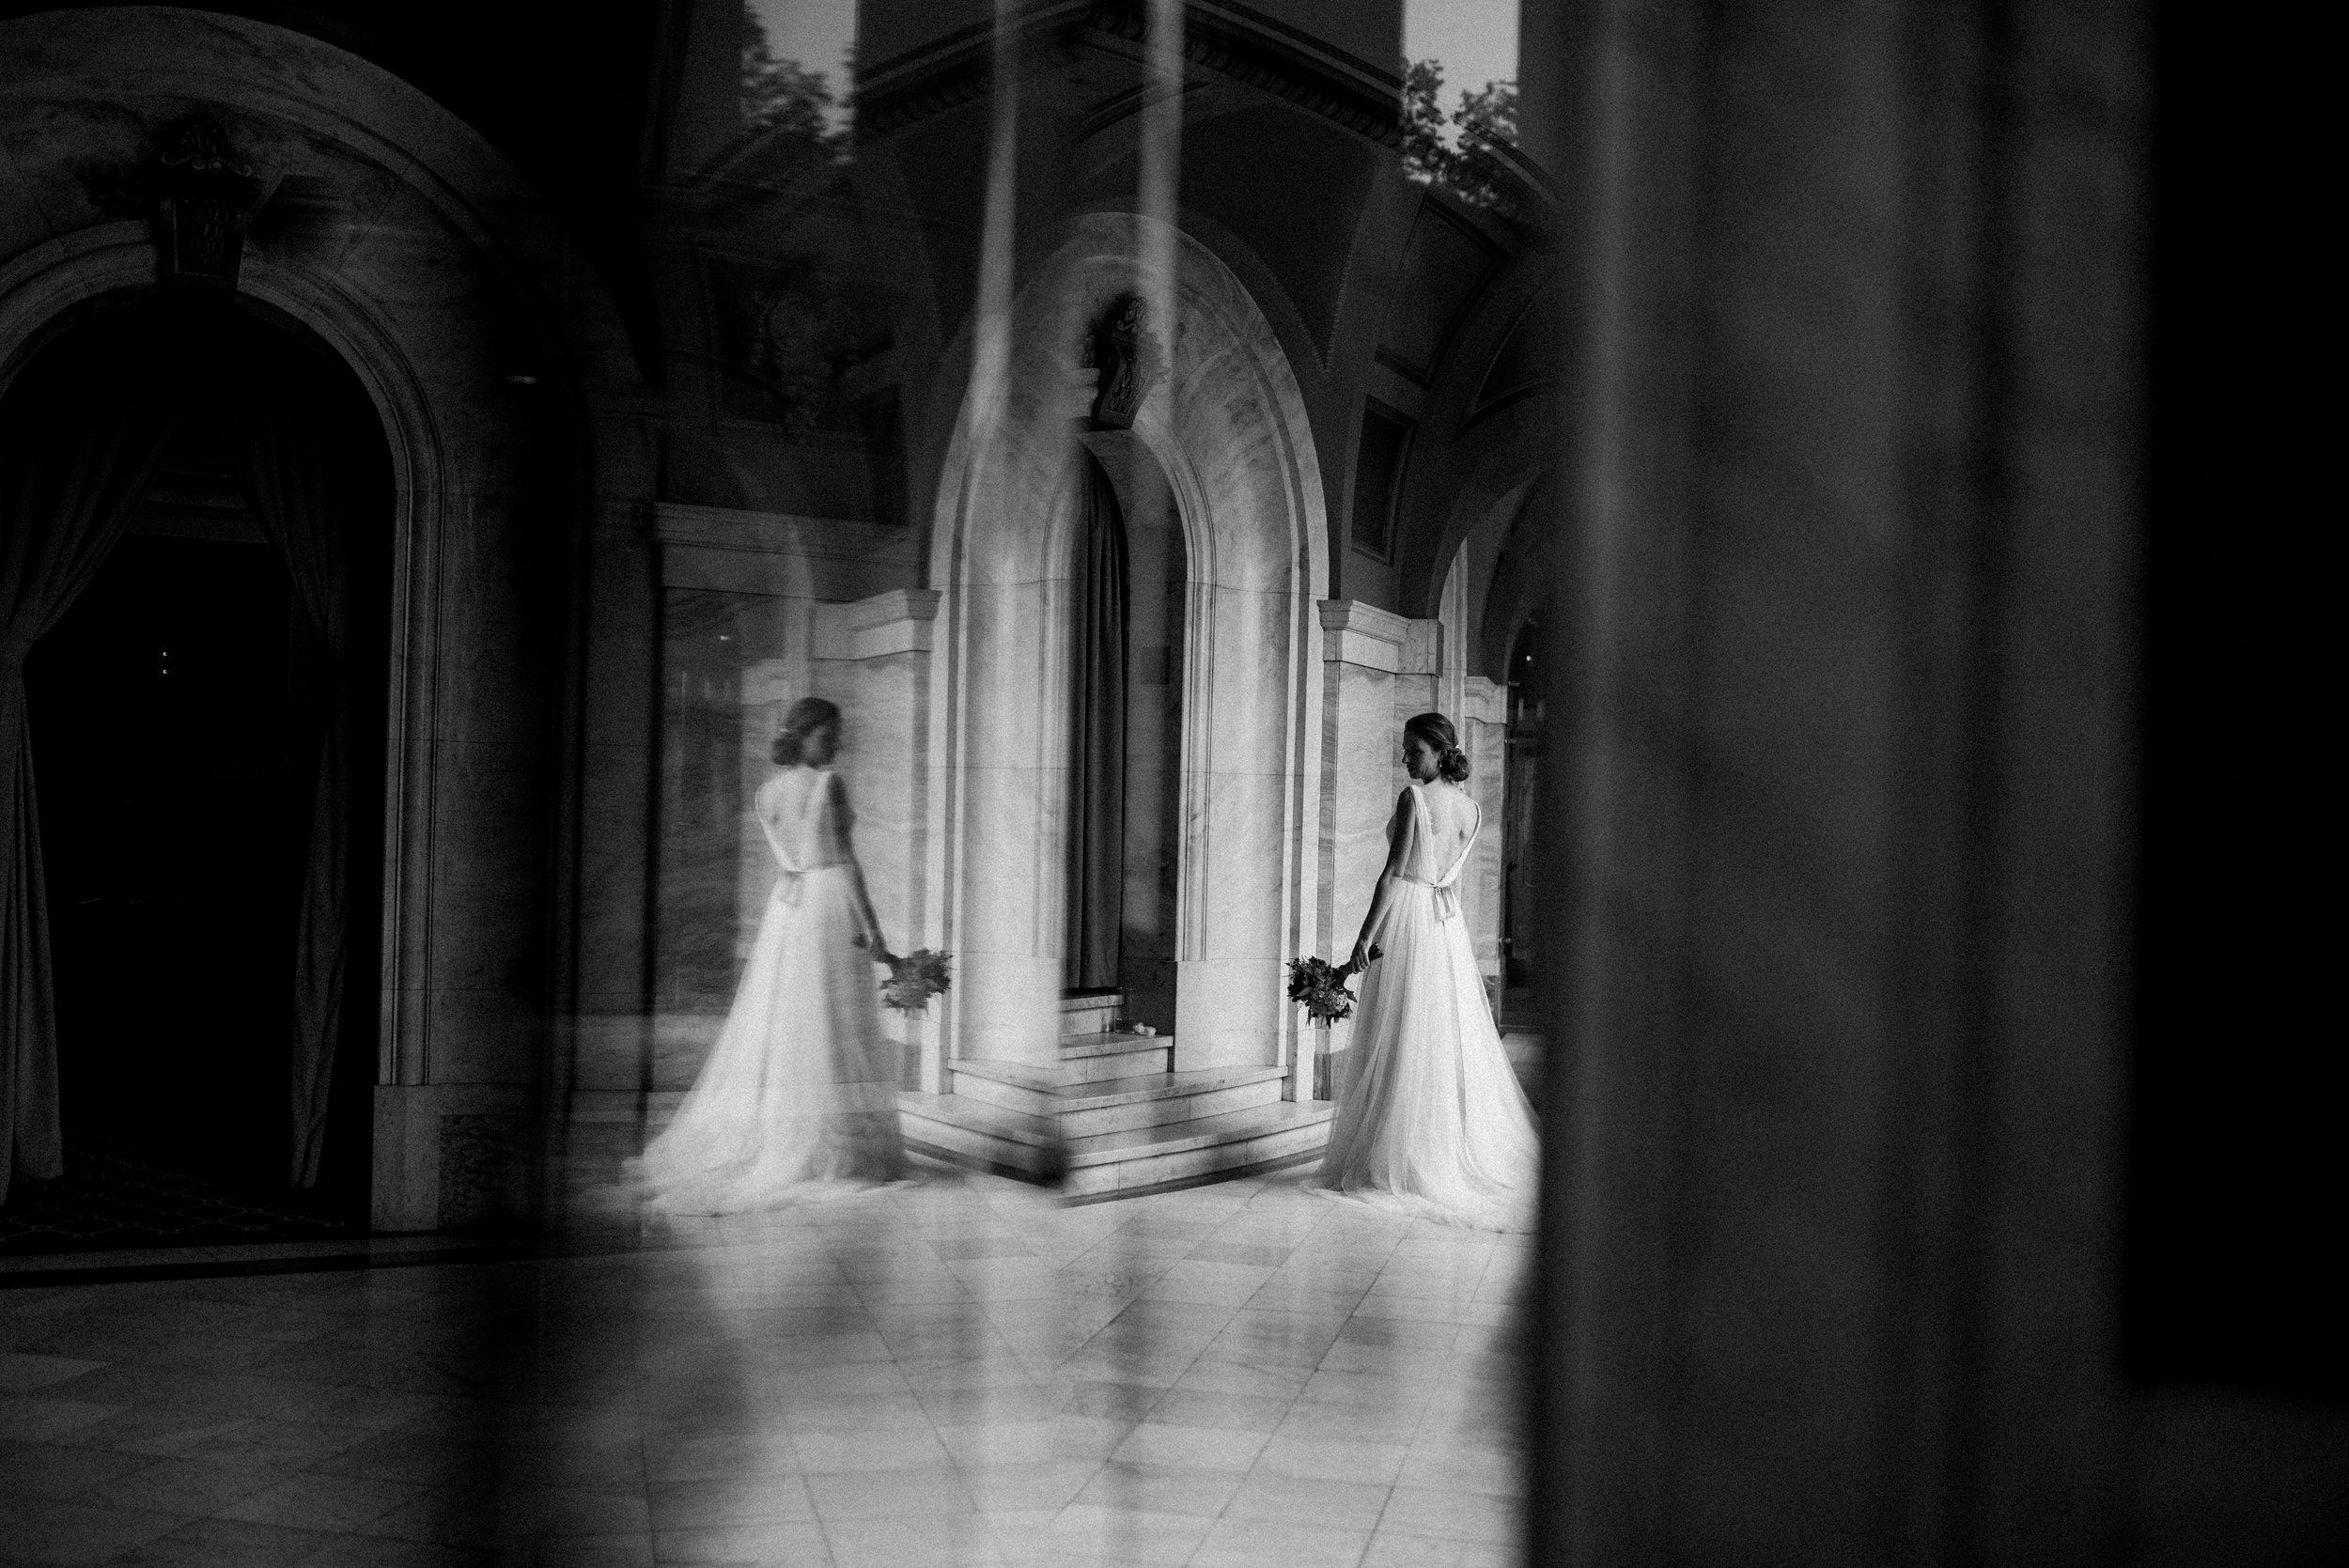 cincinnati-wedding-photographer-chelsea-hall-photography-memorial-hall-11.jpg